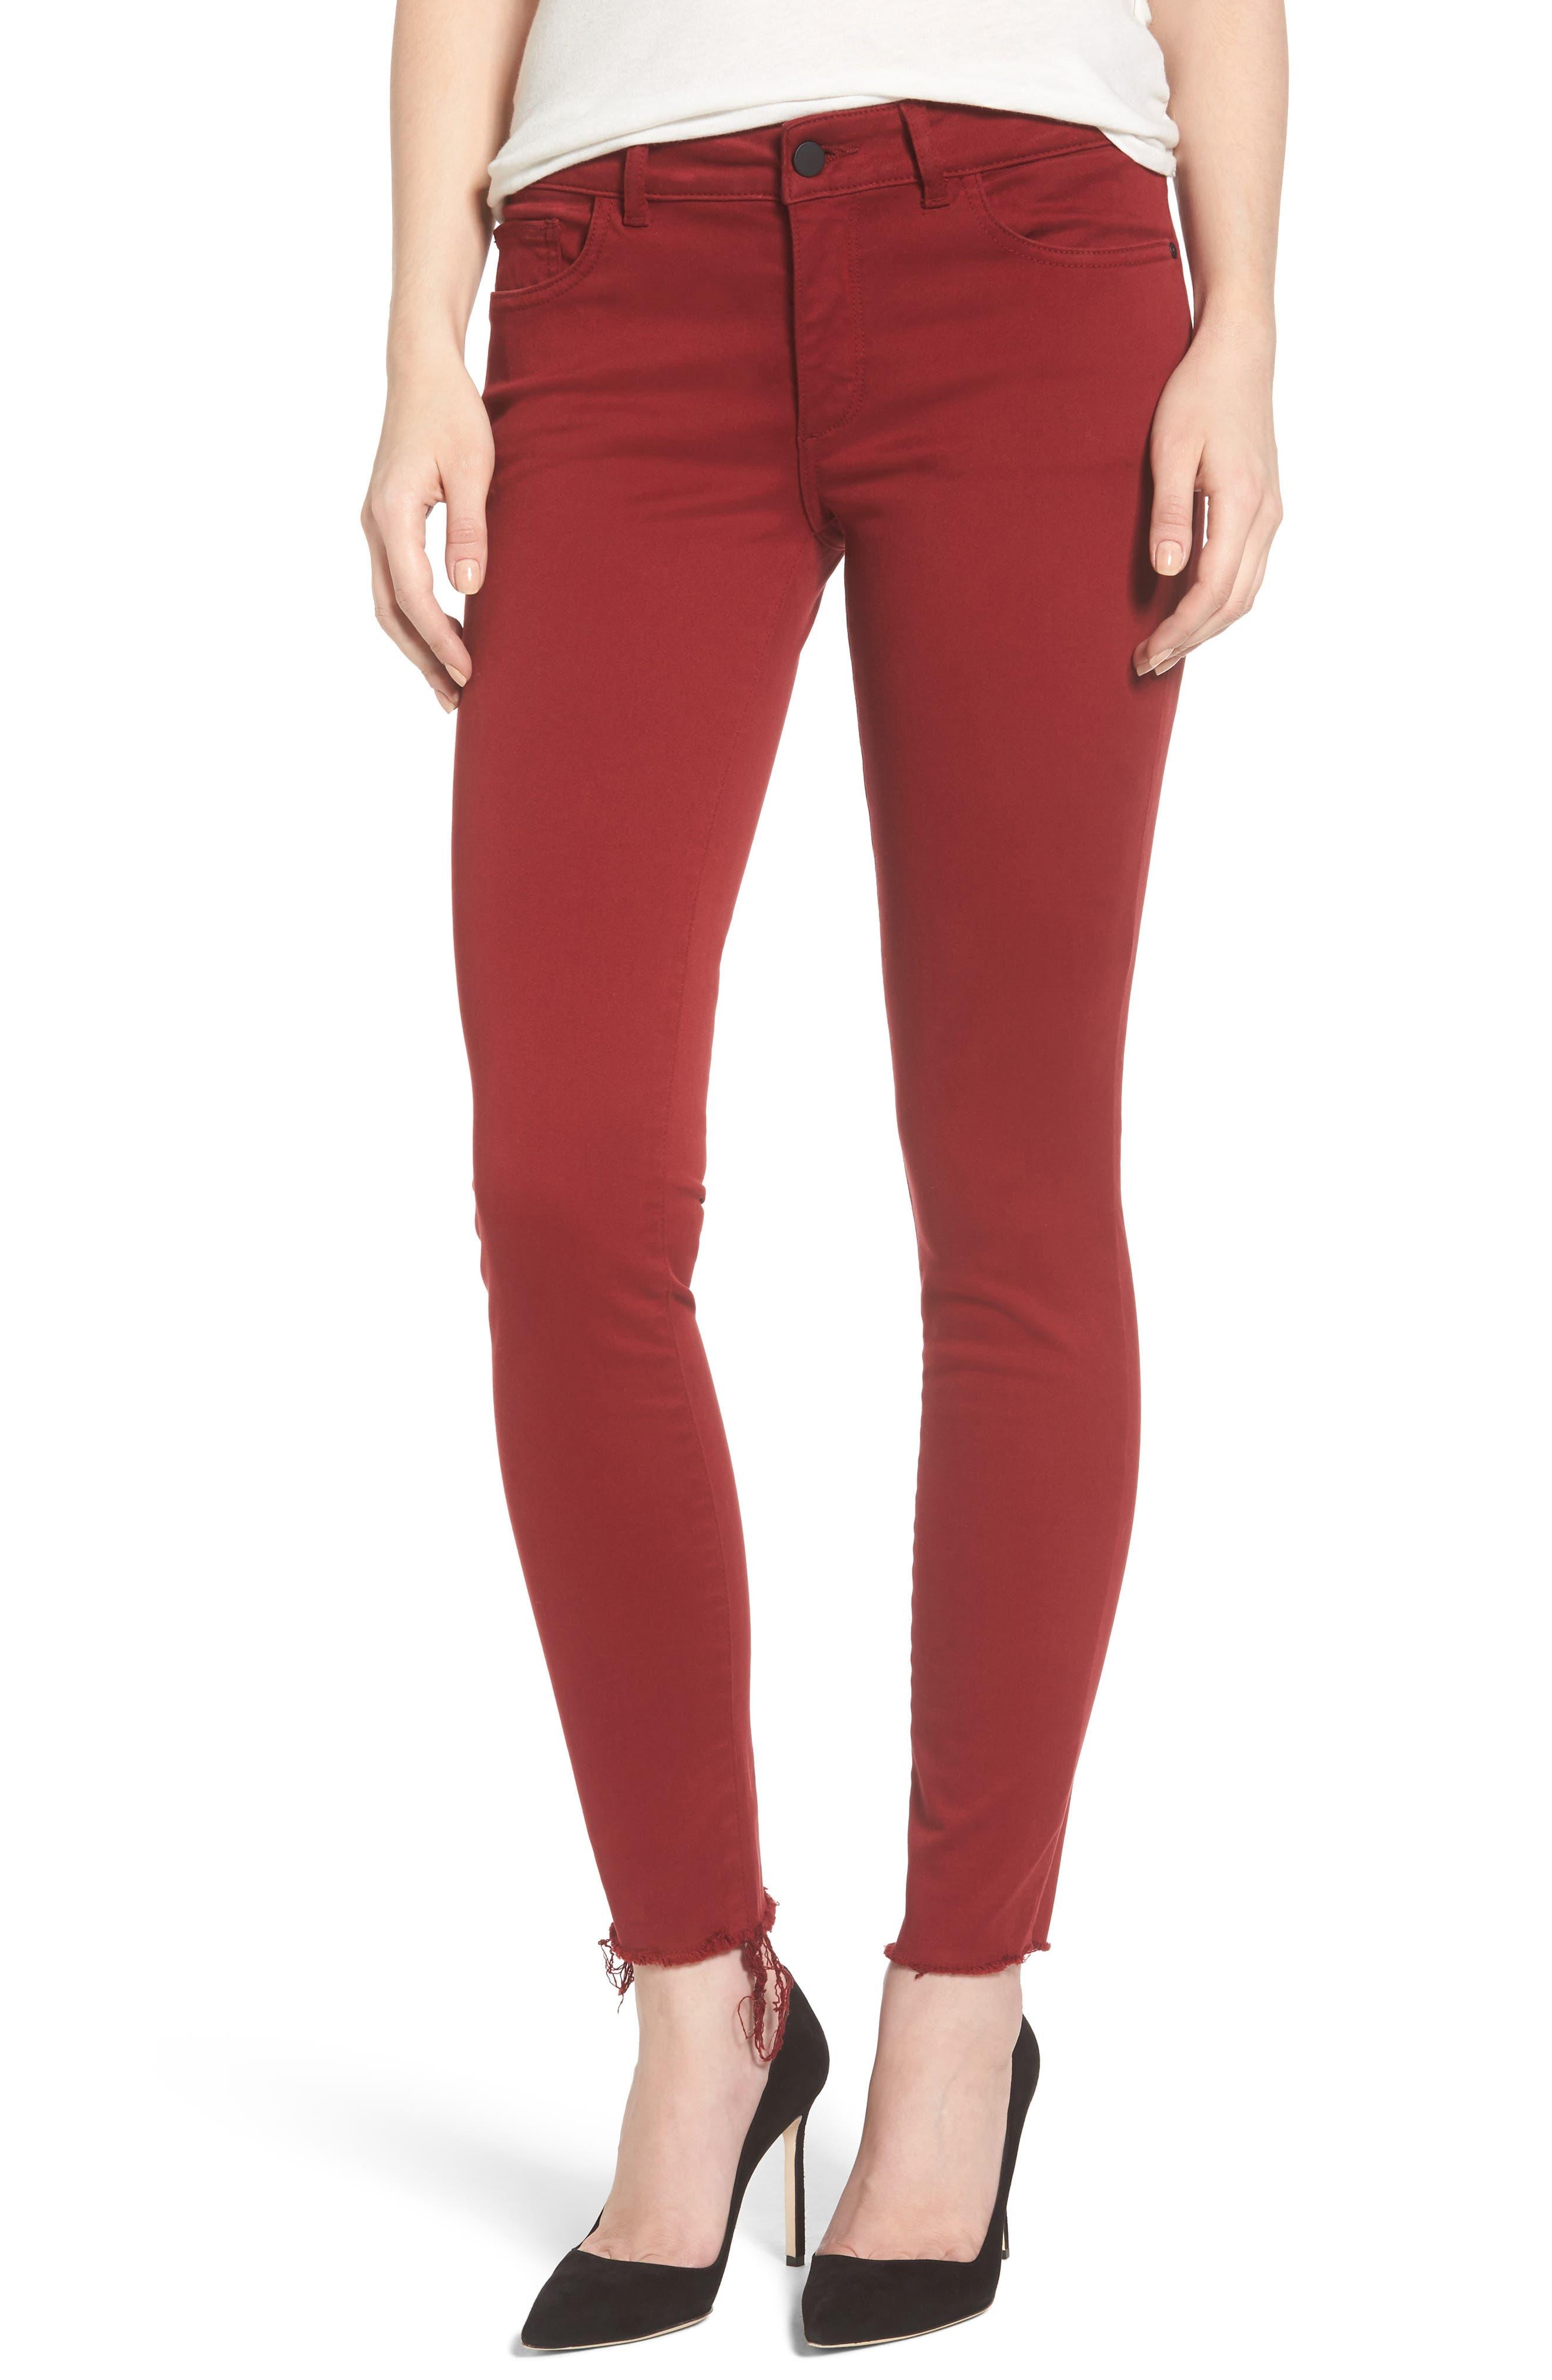 Alternate Image 1 Selected - DL1961 Emma Power Legging Jeans (Rhubarb)